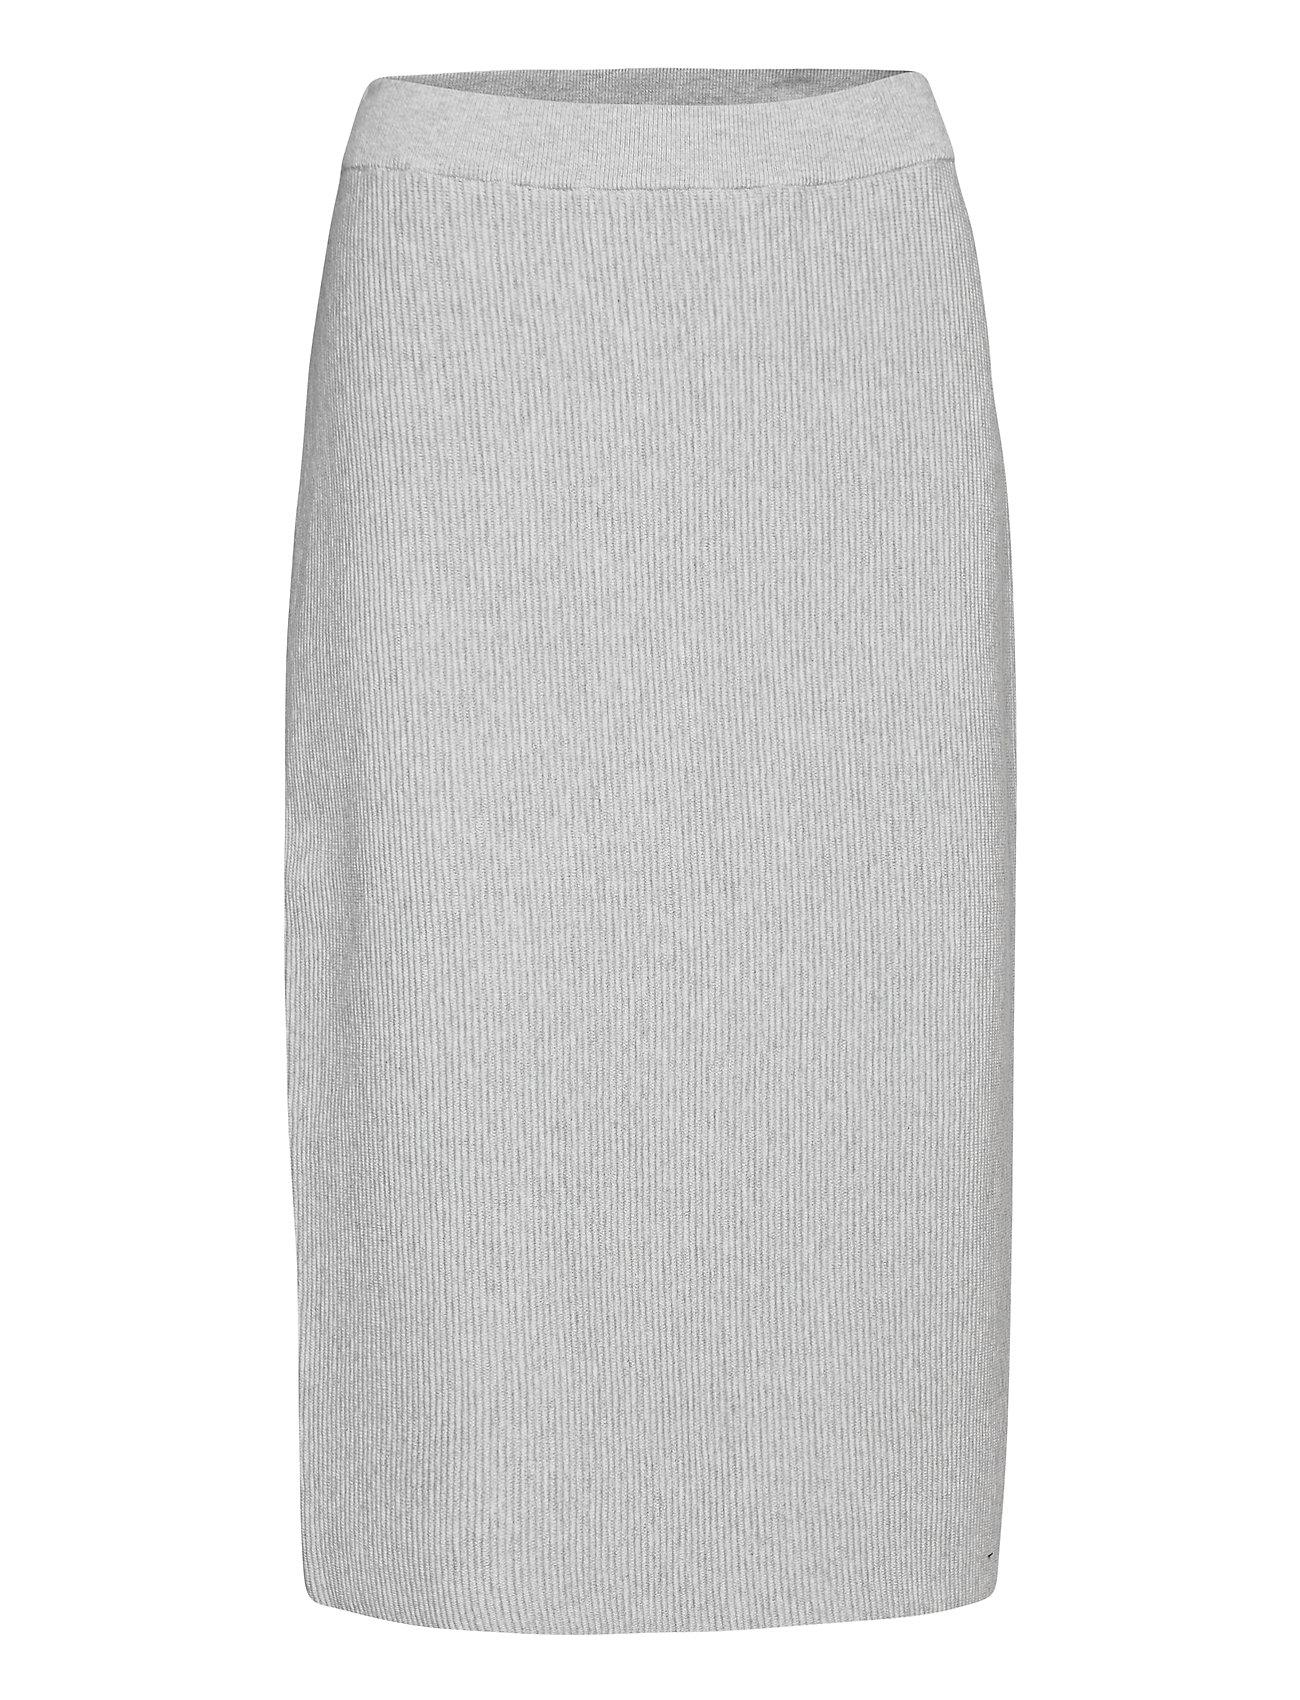 Image of Skirts Knitted Knælang Nederdel Grå EDC By Esprit (3455223493)